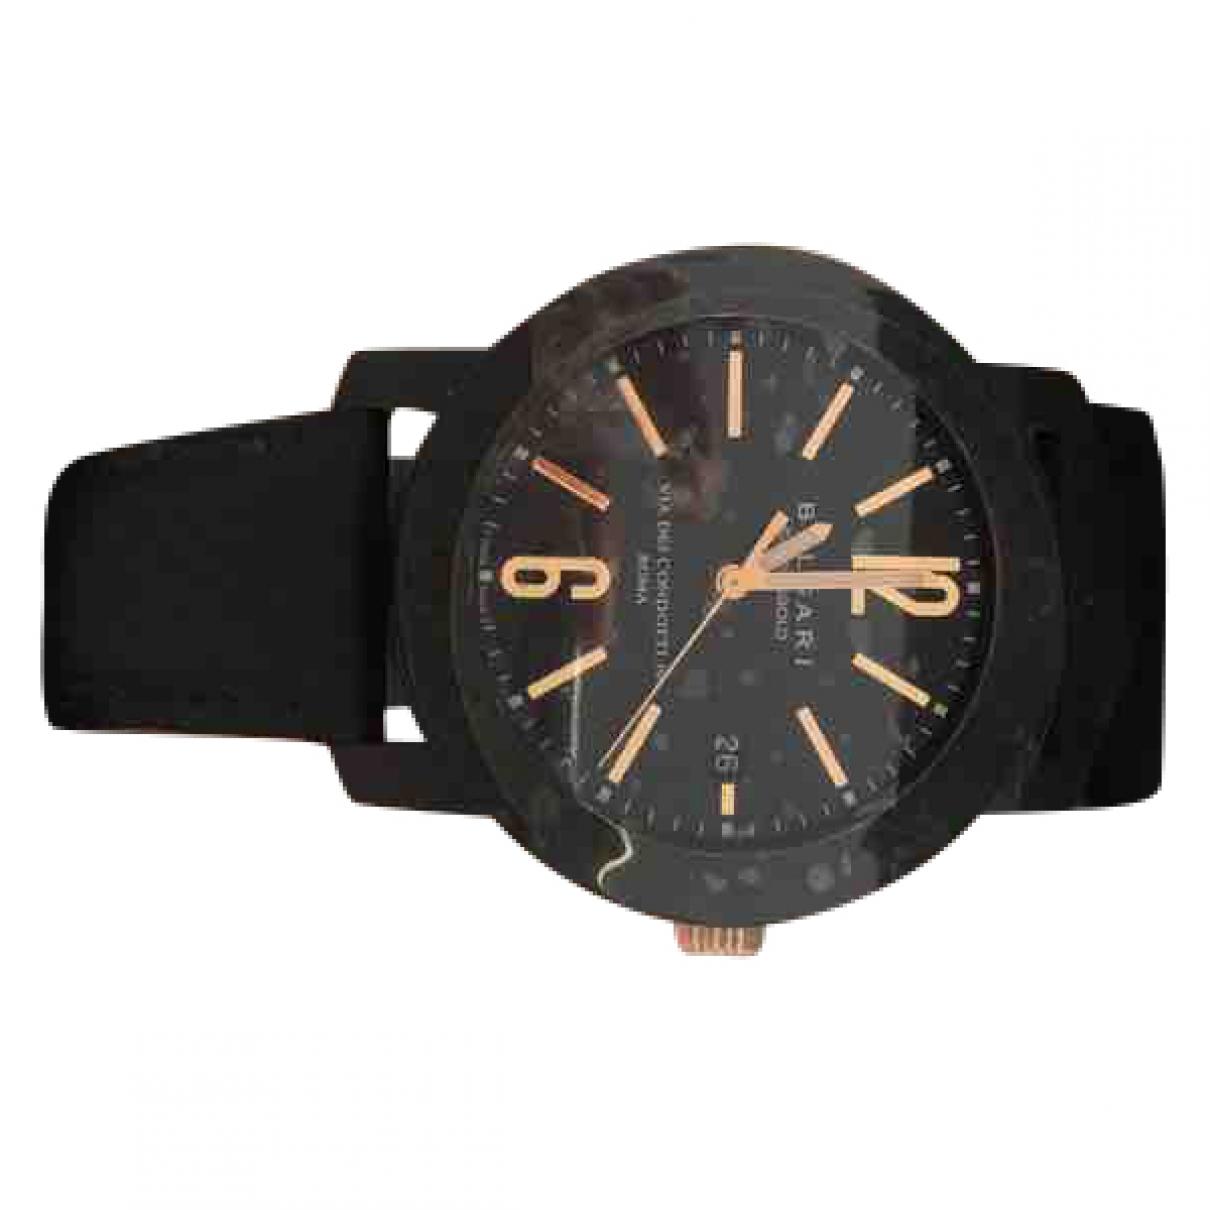 Reloj Carbon Gold Bvlgari